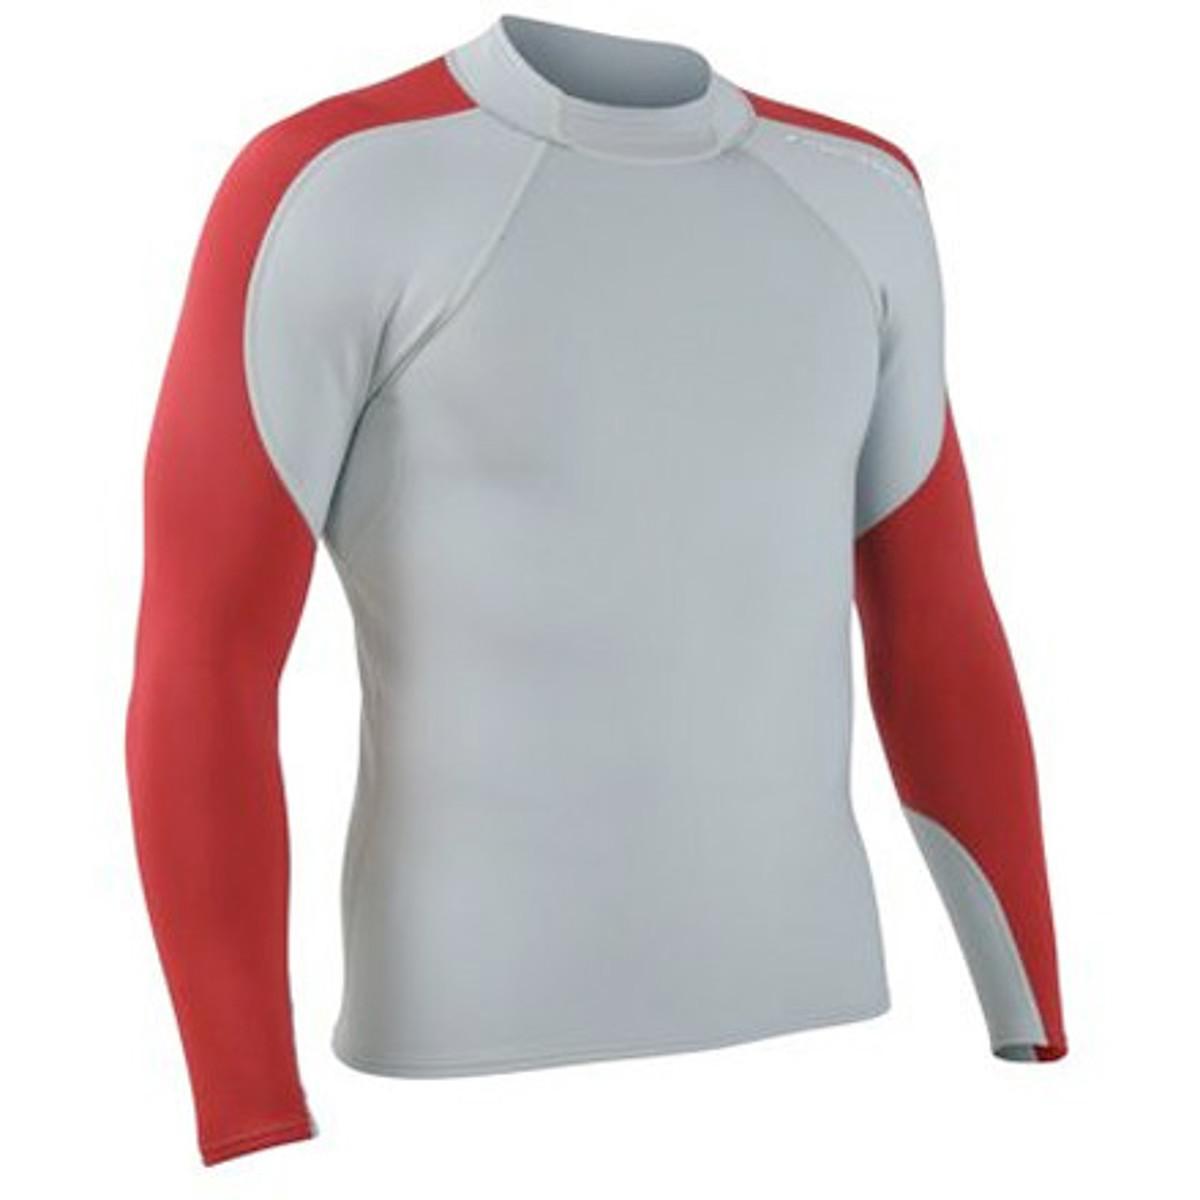 NRS HydroSkin Shirt - L/S